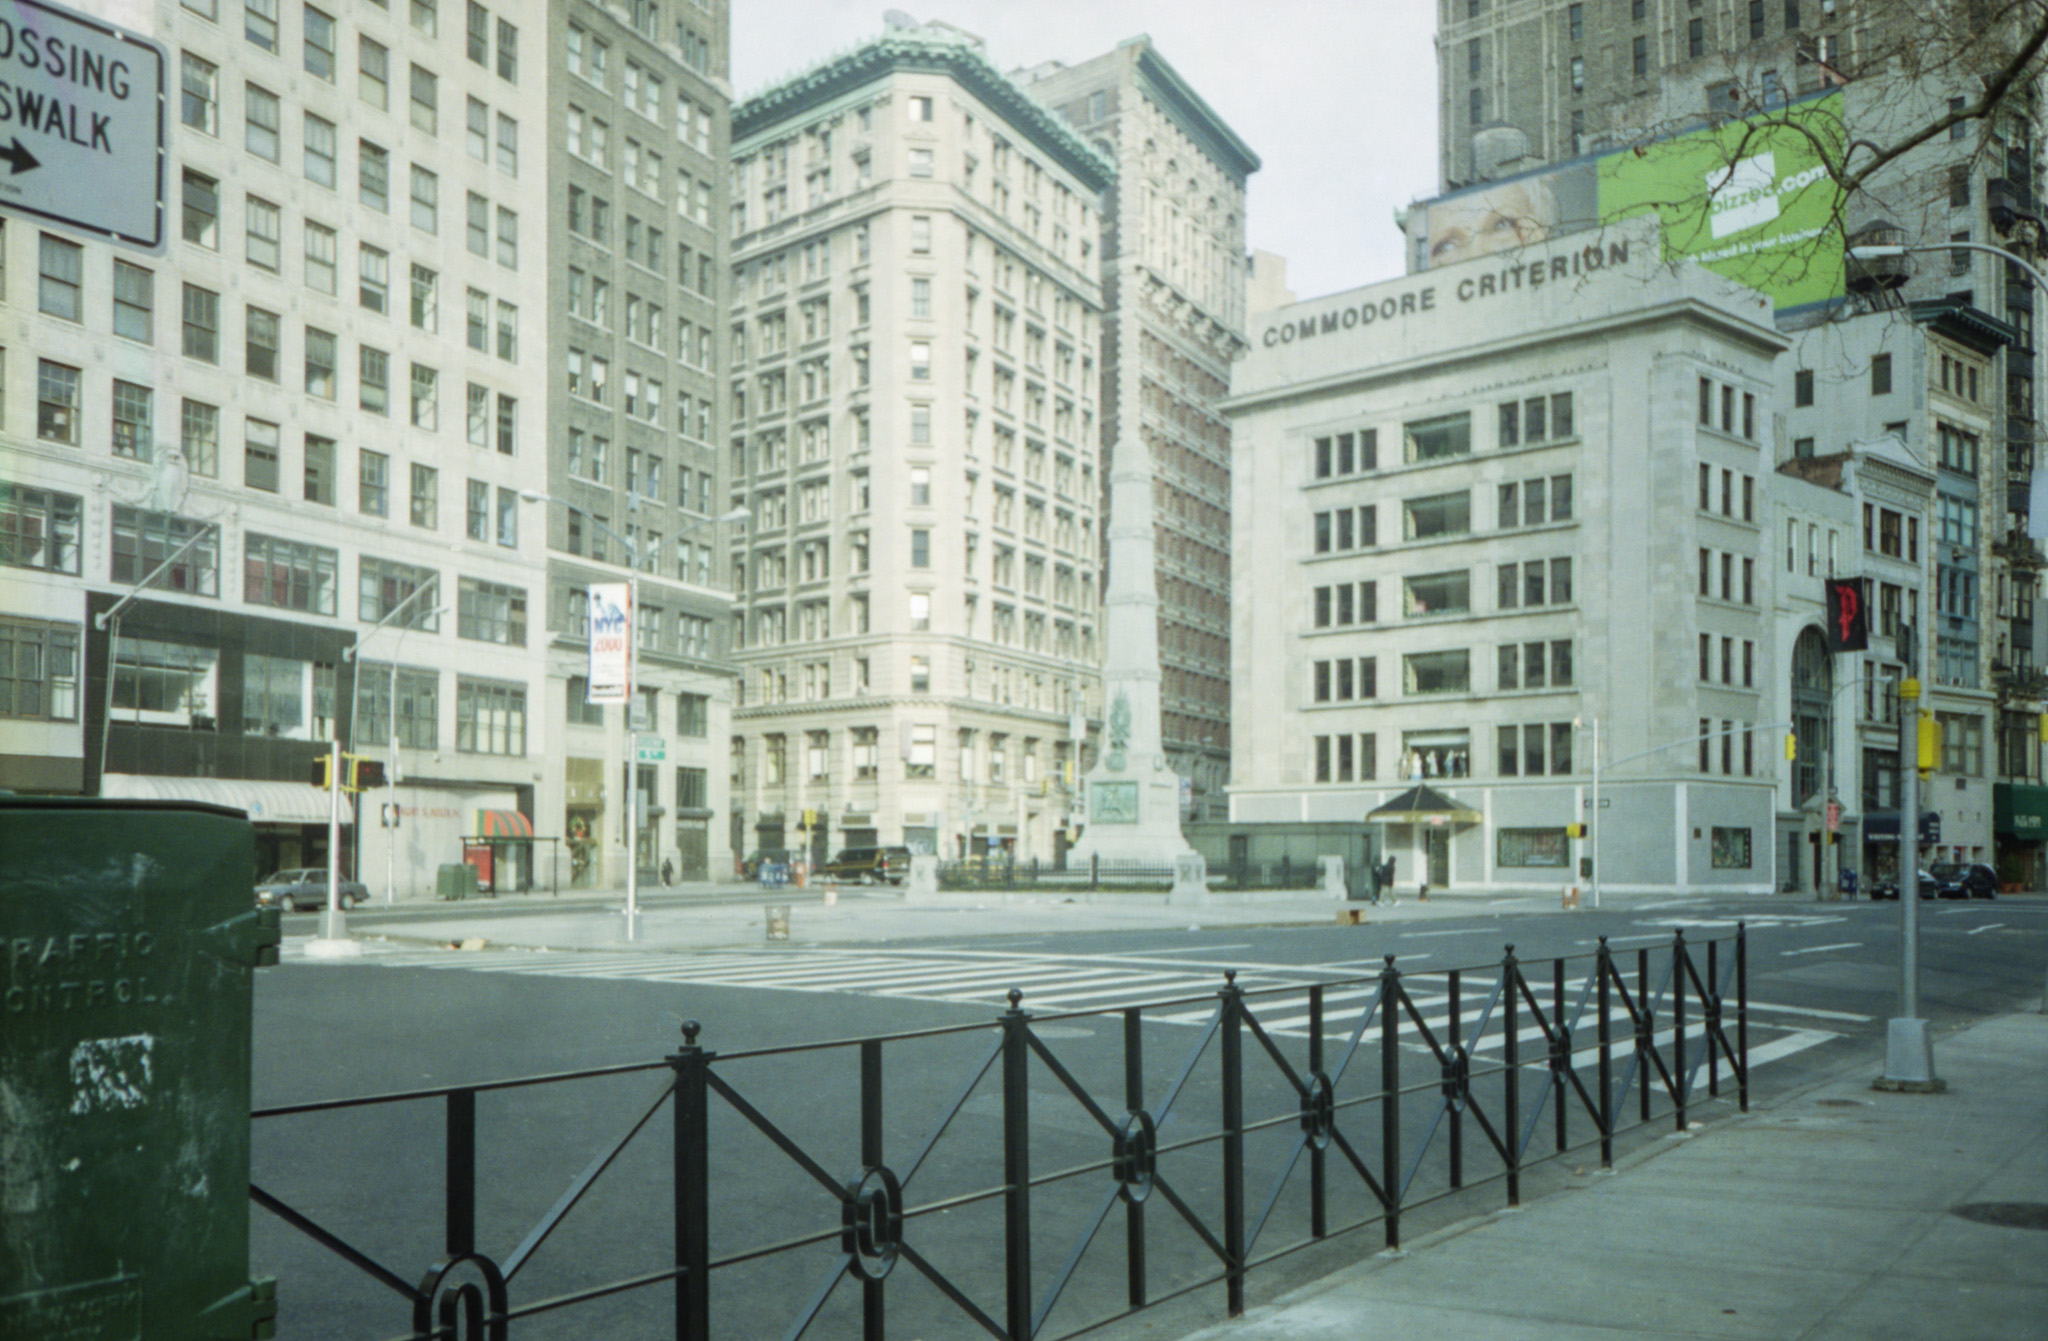 NYC-1999-017.jpg